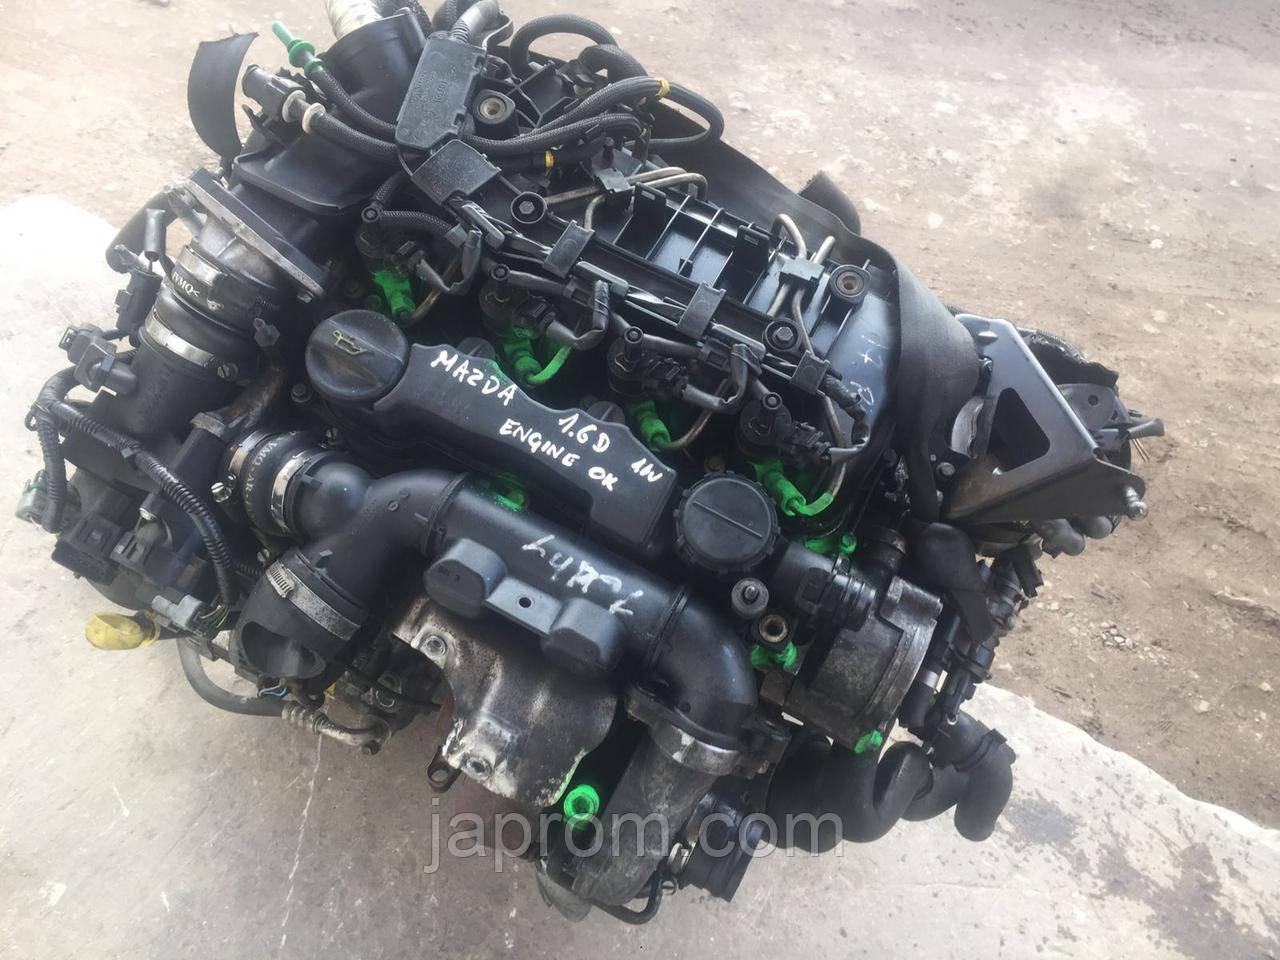 Мотор (Двигатель) Mazda 3 1.6 DI Turbo Y601 110л.с 2003-2009